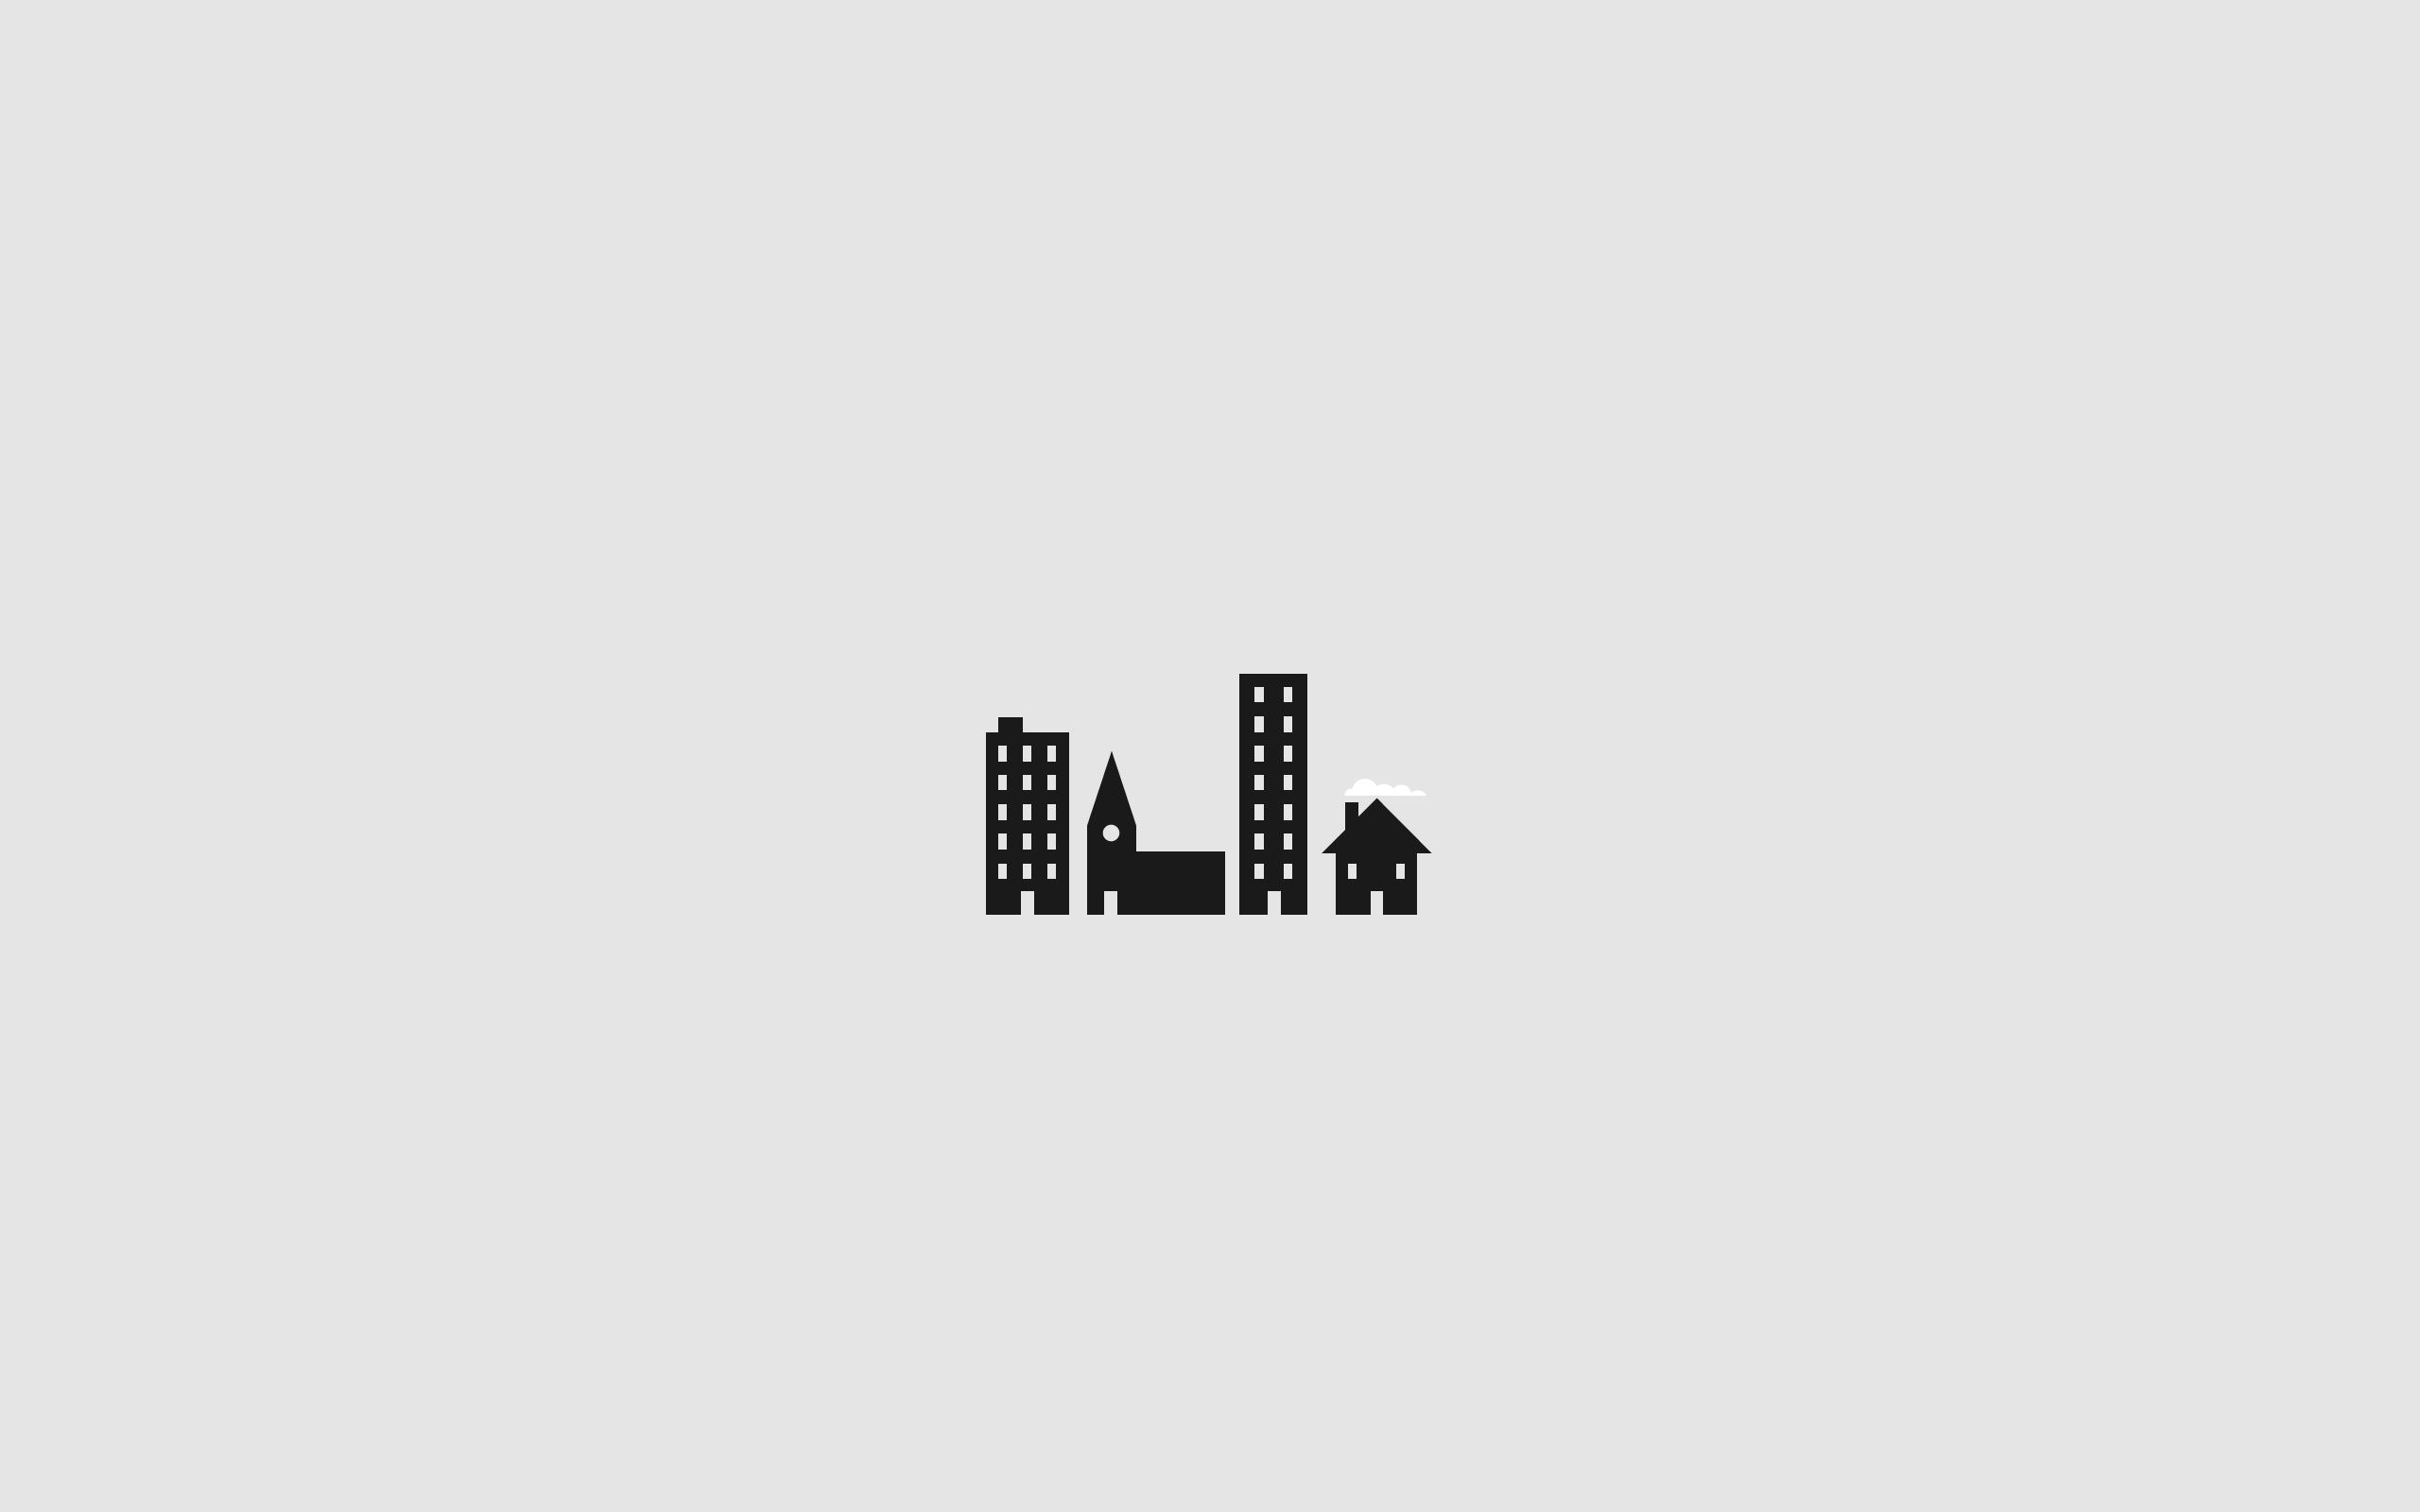 city minimal wallpaper graphics pinterest minimalist